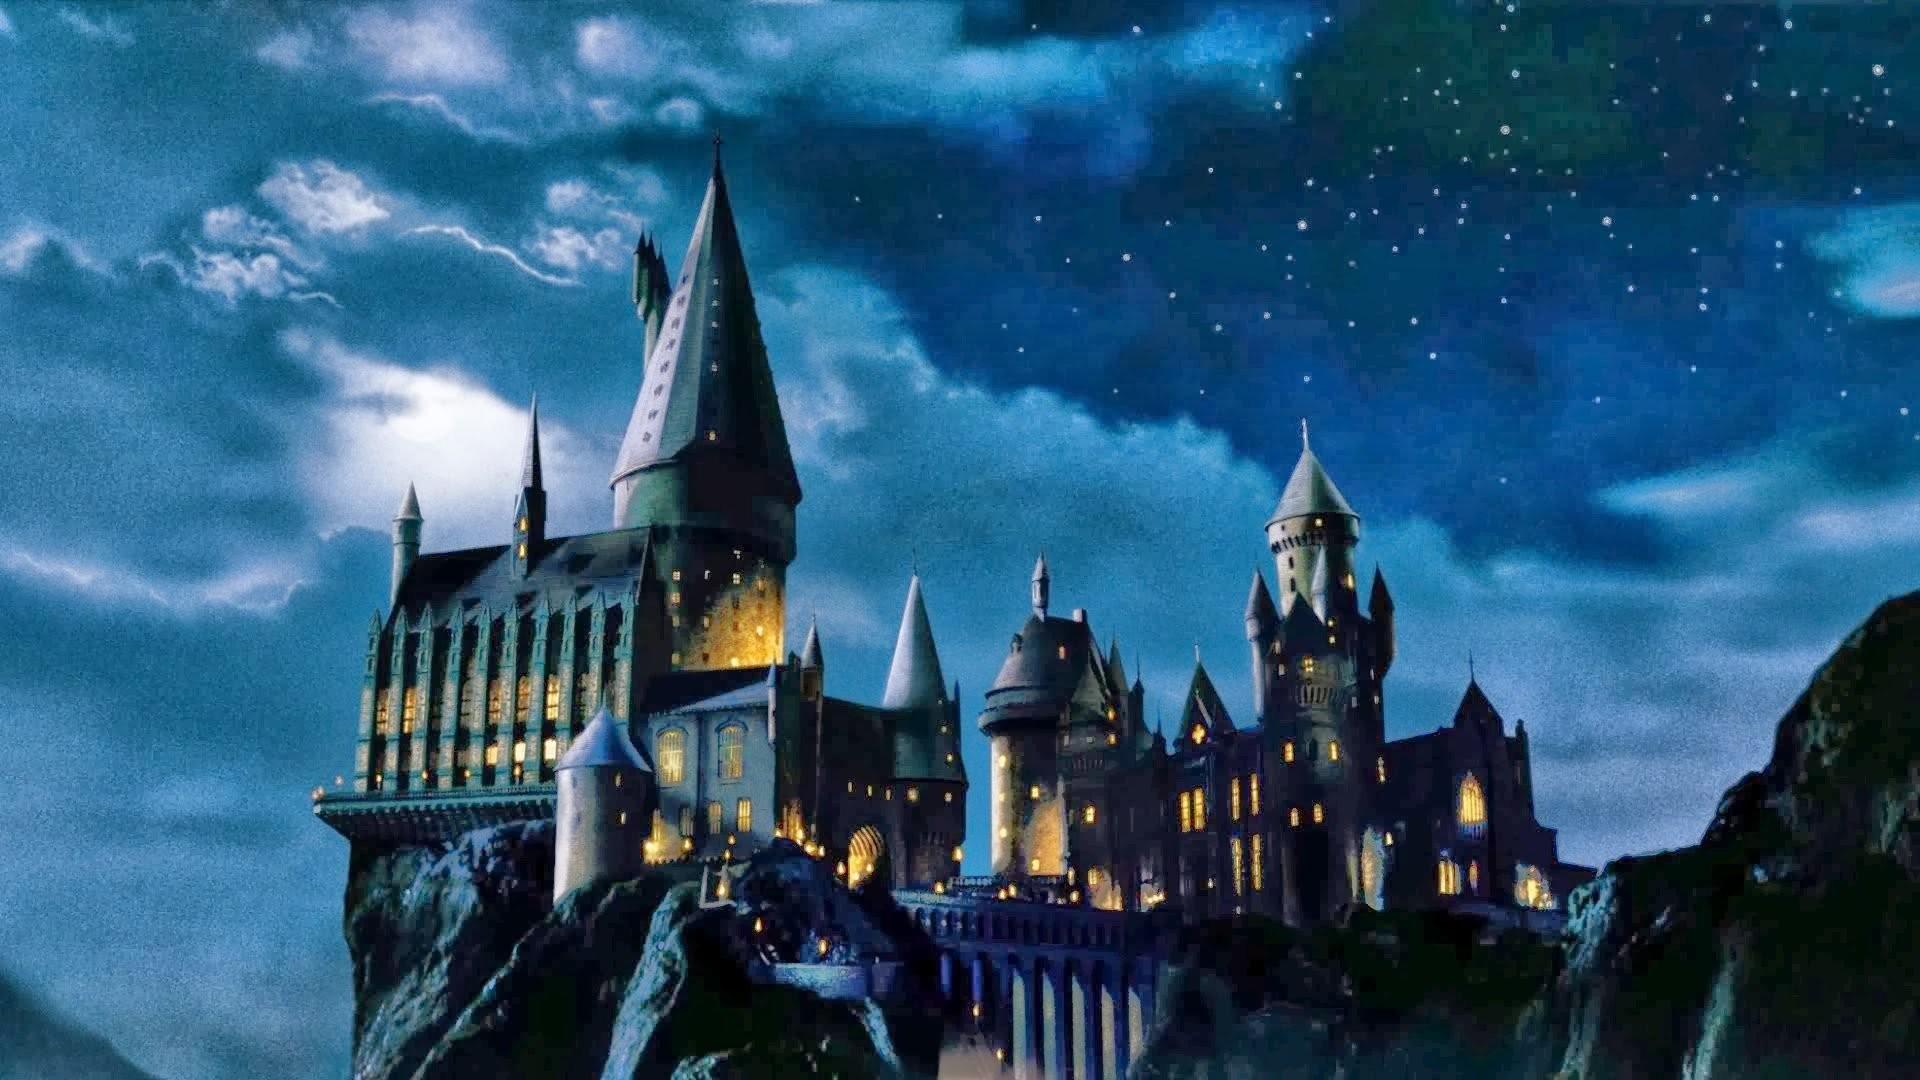 Hogwarts Castle Wallpaper ①